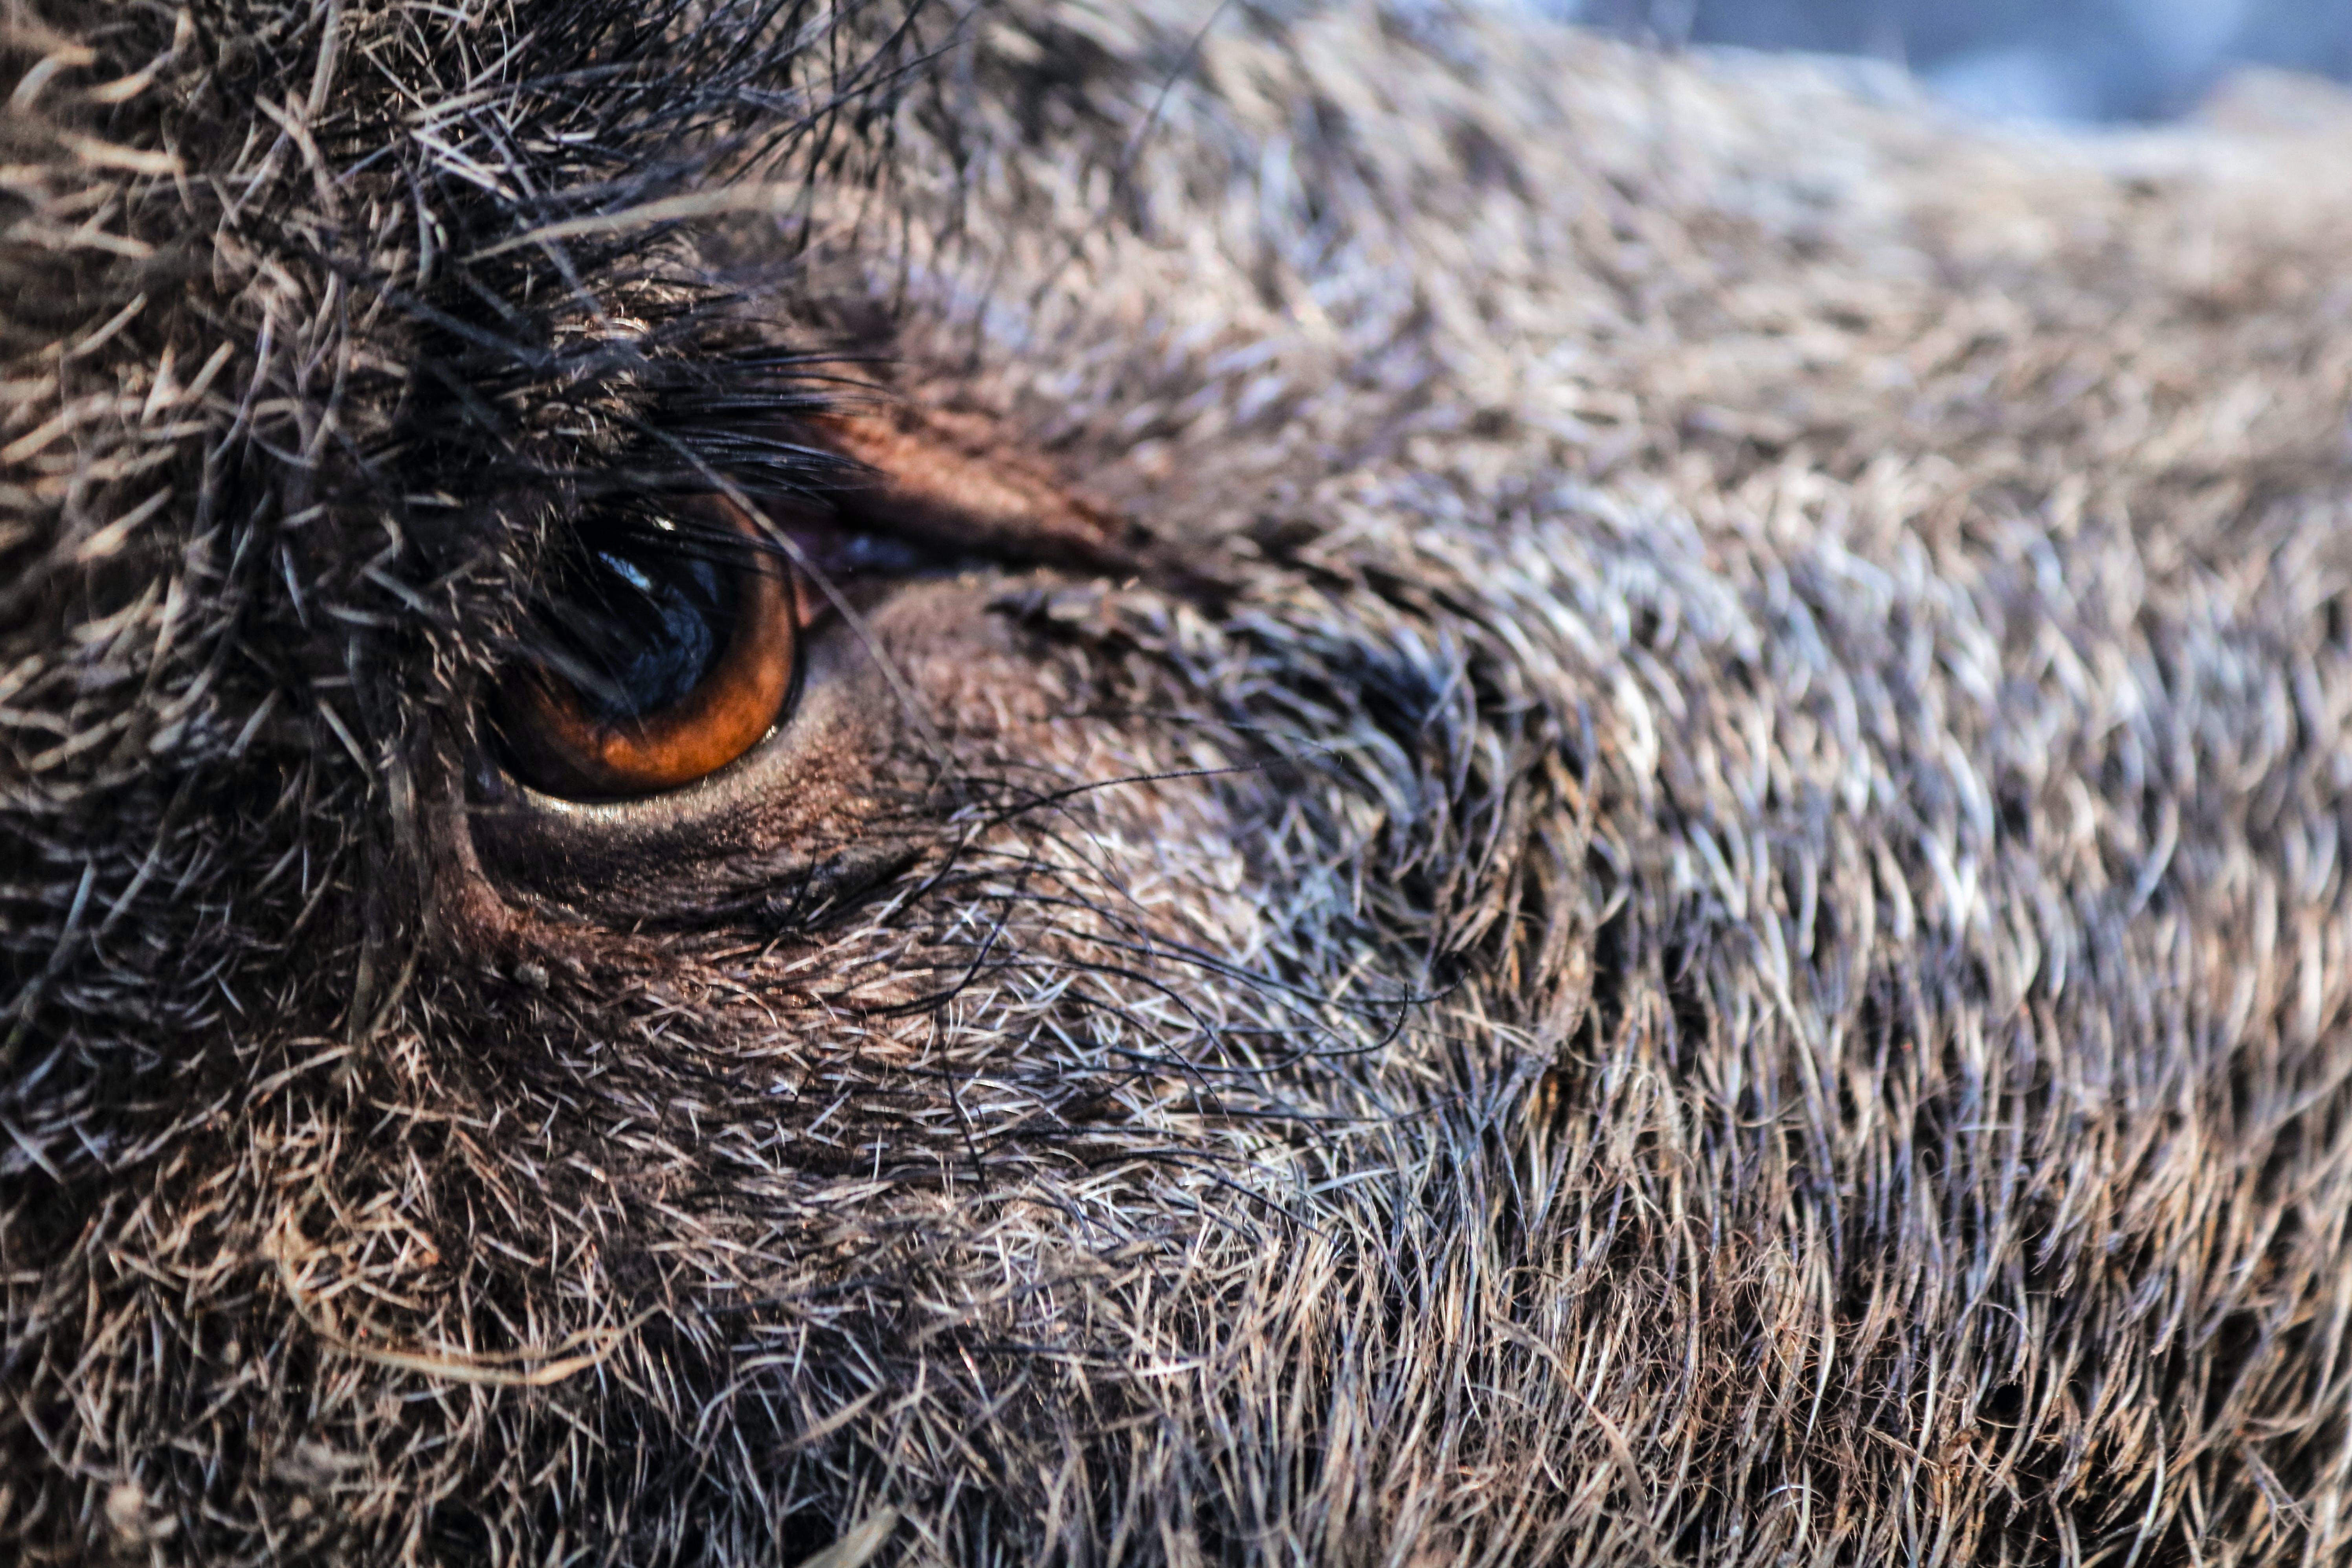 Close-up Photography of Animal's Eye